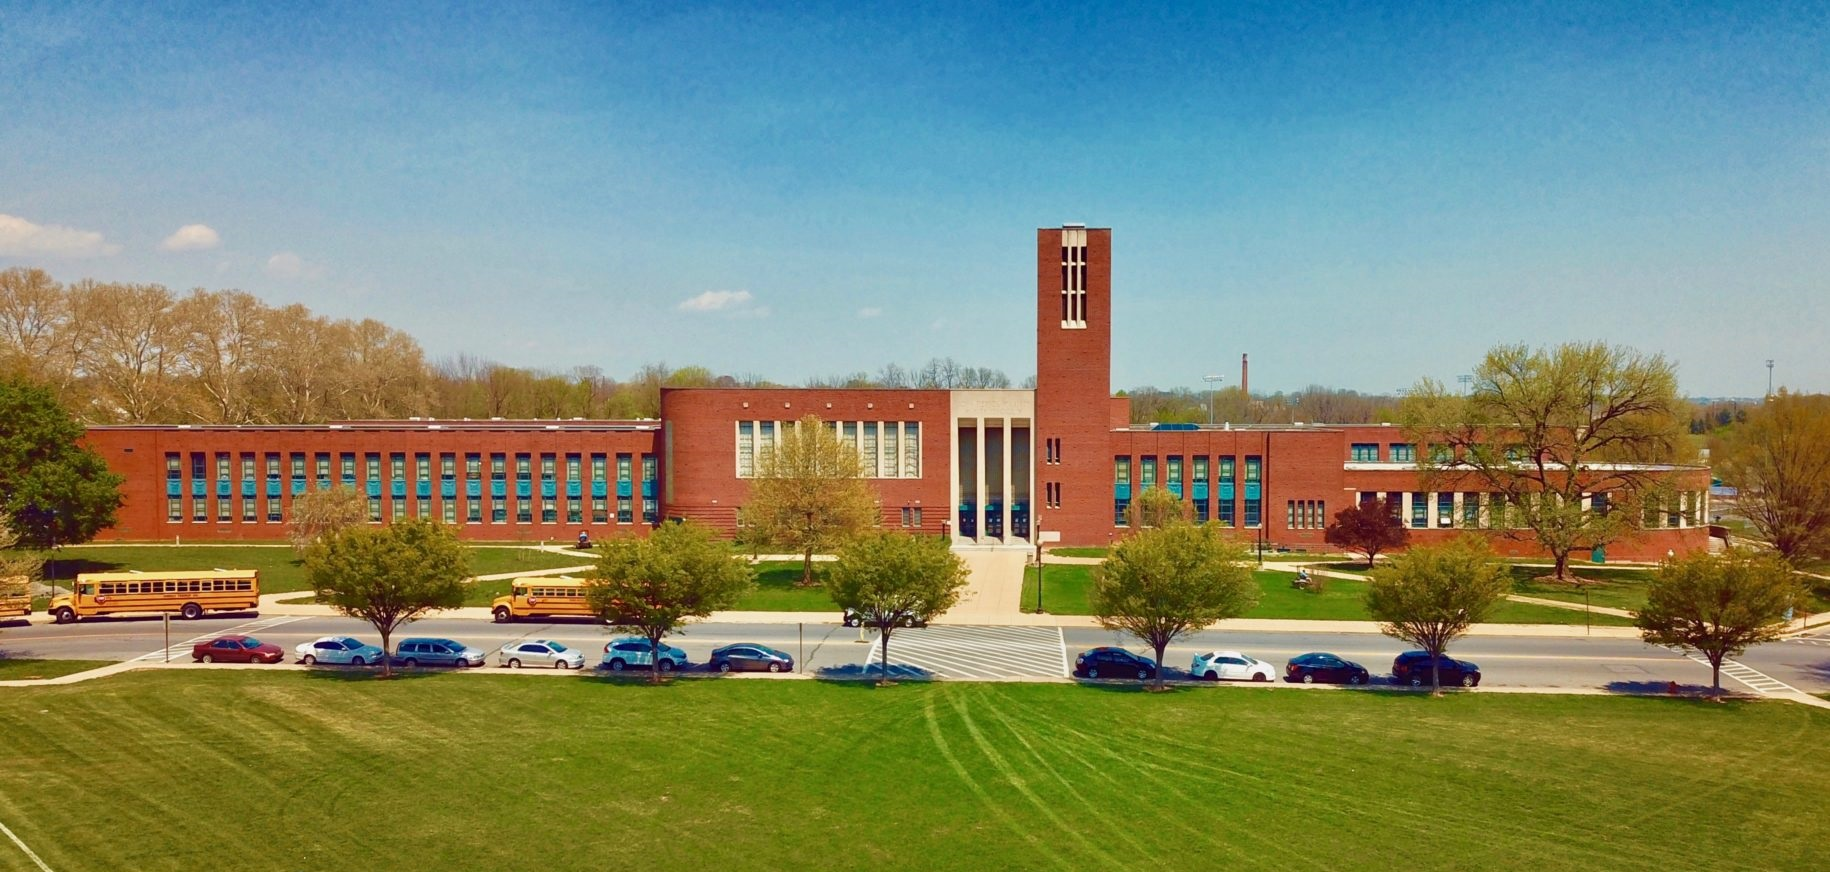 J.P. McCaskey High School (Source: SDL)